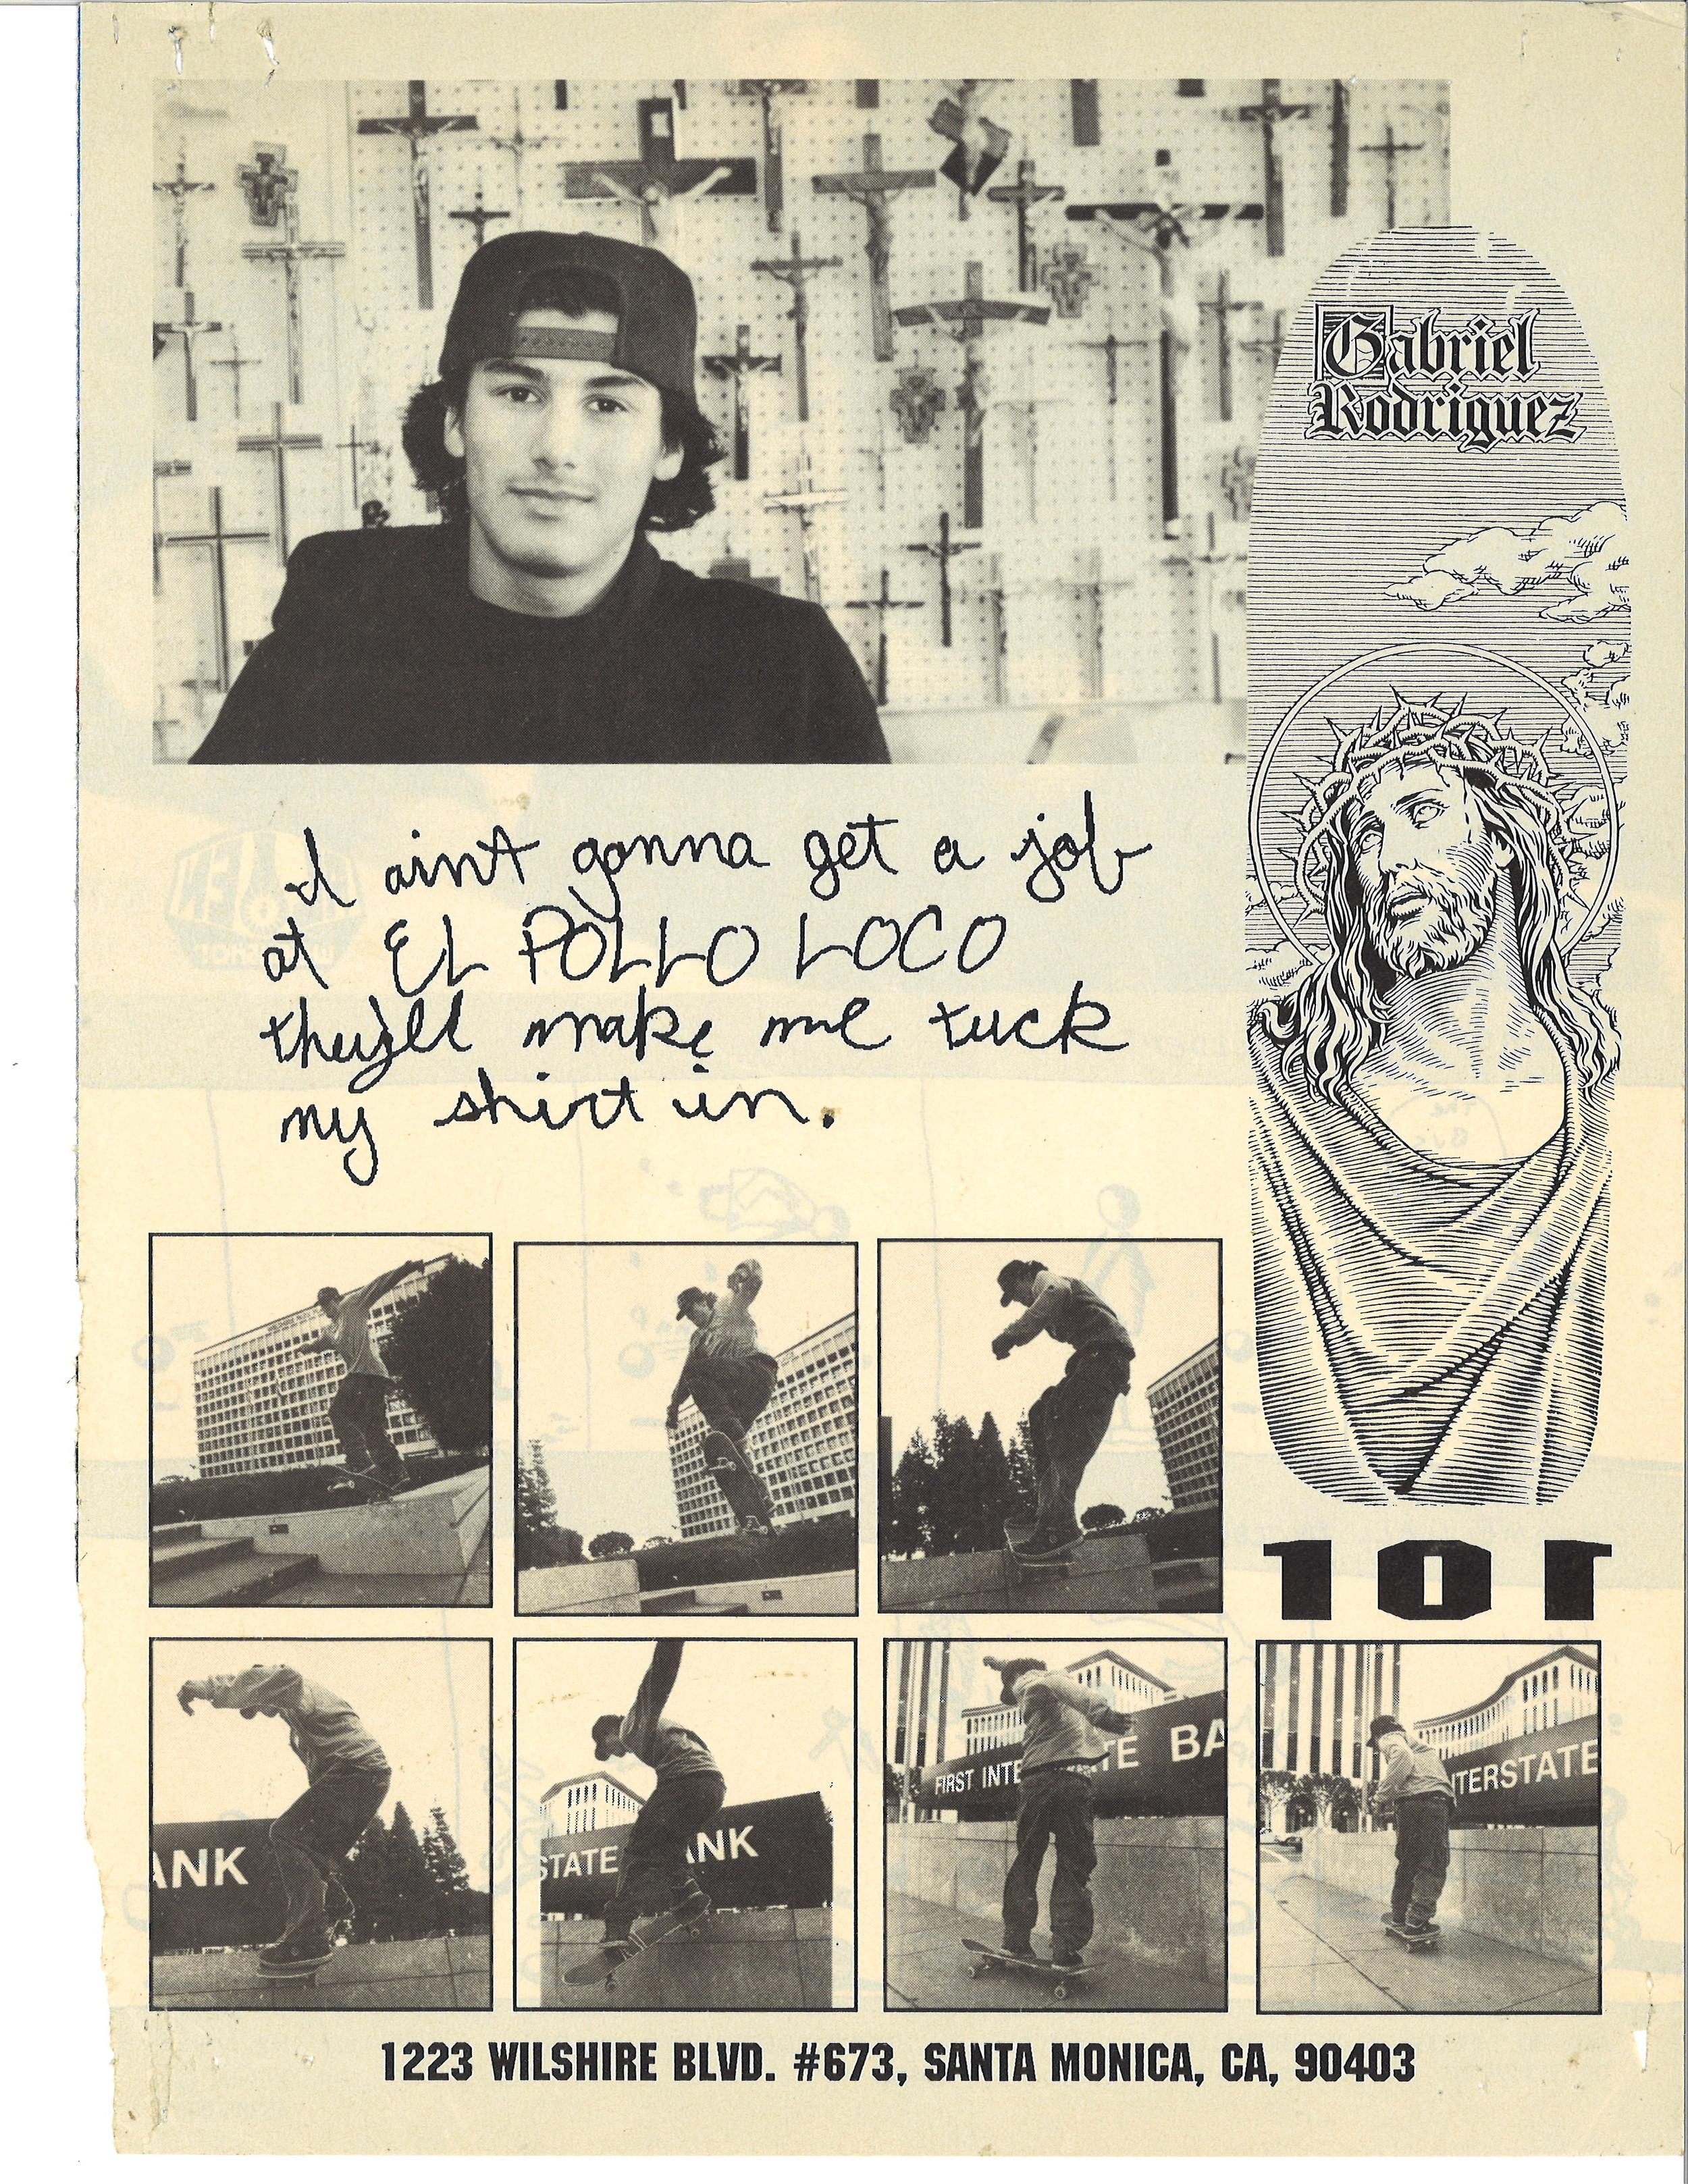 Dwindle Heritage 101 Skateboards Original Gabriel Rodriguez Jesus deck ad 1991